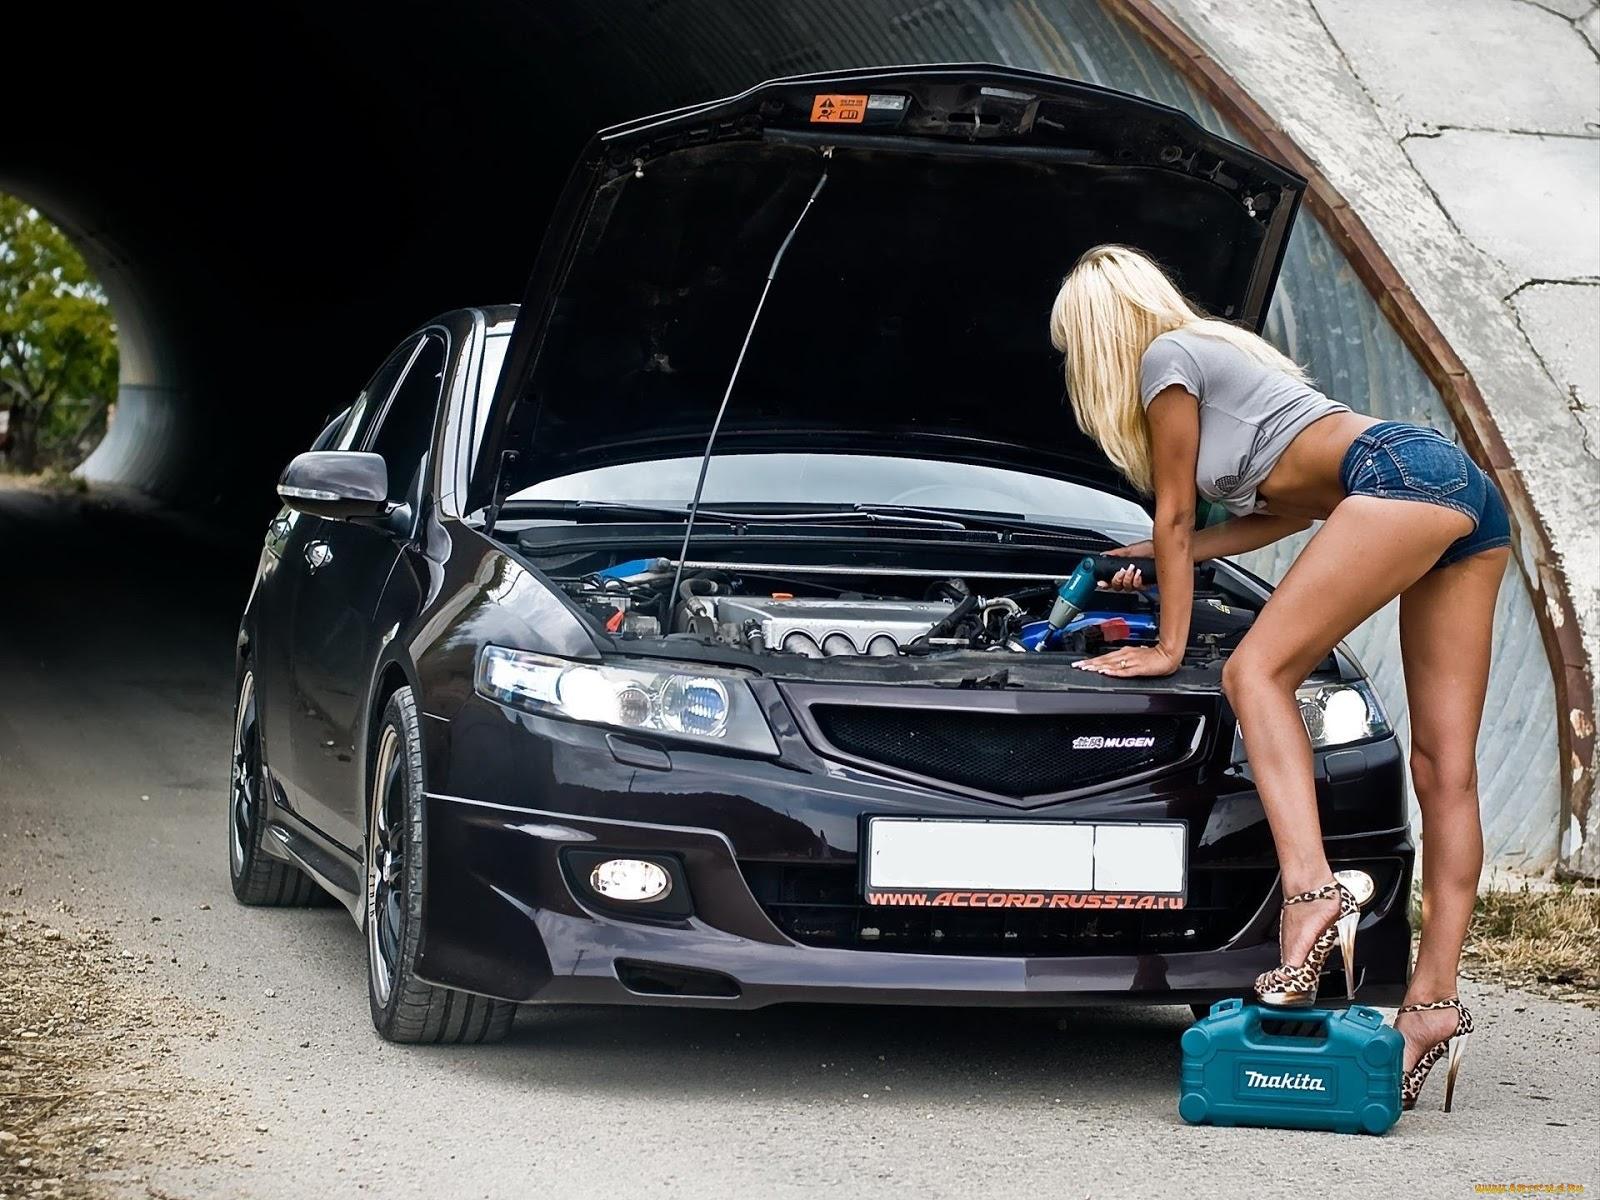 honda mechanic Τα Honda δεν χαλάνε ποτέ, λέει έρευνα Dacia, Honda, Honda Jazz, Mazda, Nissan, OCU, service, Toyota, zblog